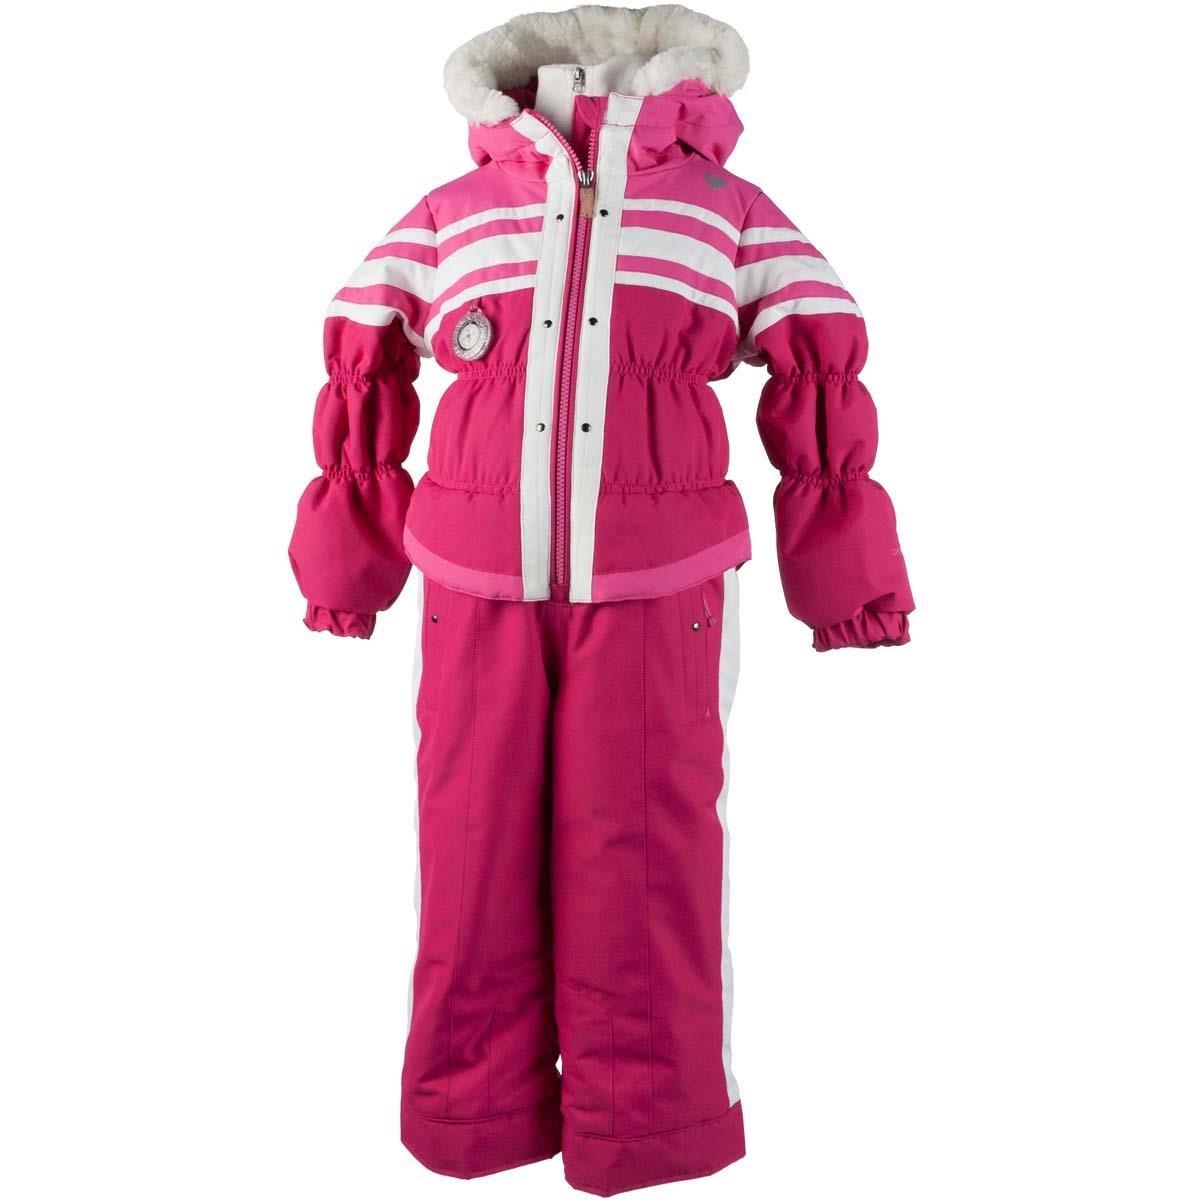 Obermeyer Kids Baby Girl's Skiter Suit (Toddler/Little Kids/Big Kids) Glamour Pink Suit by Obermeyer Kids